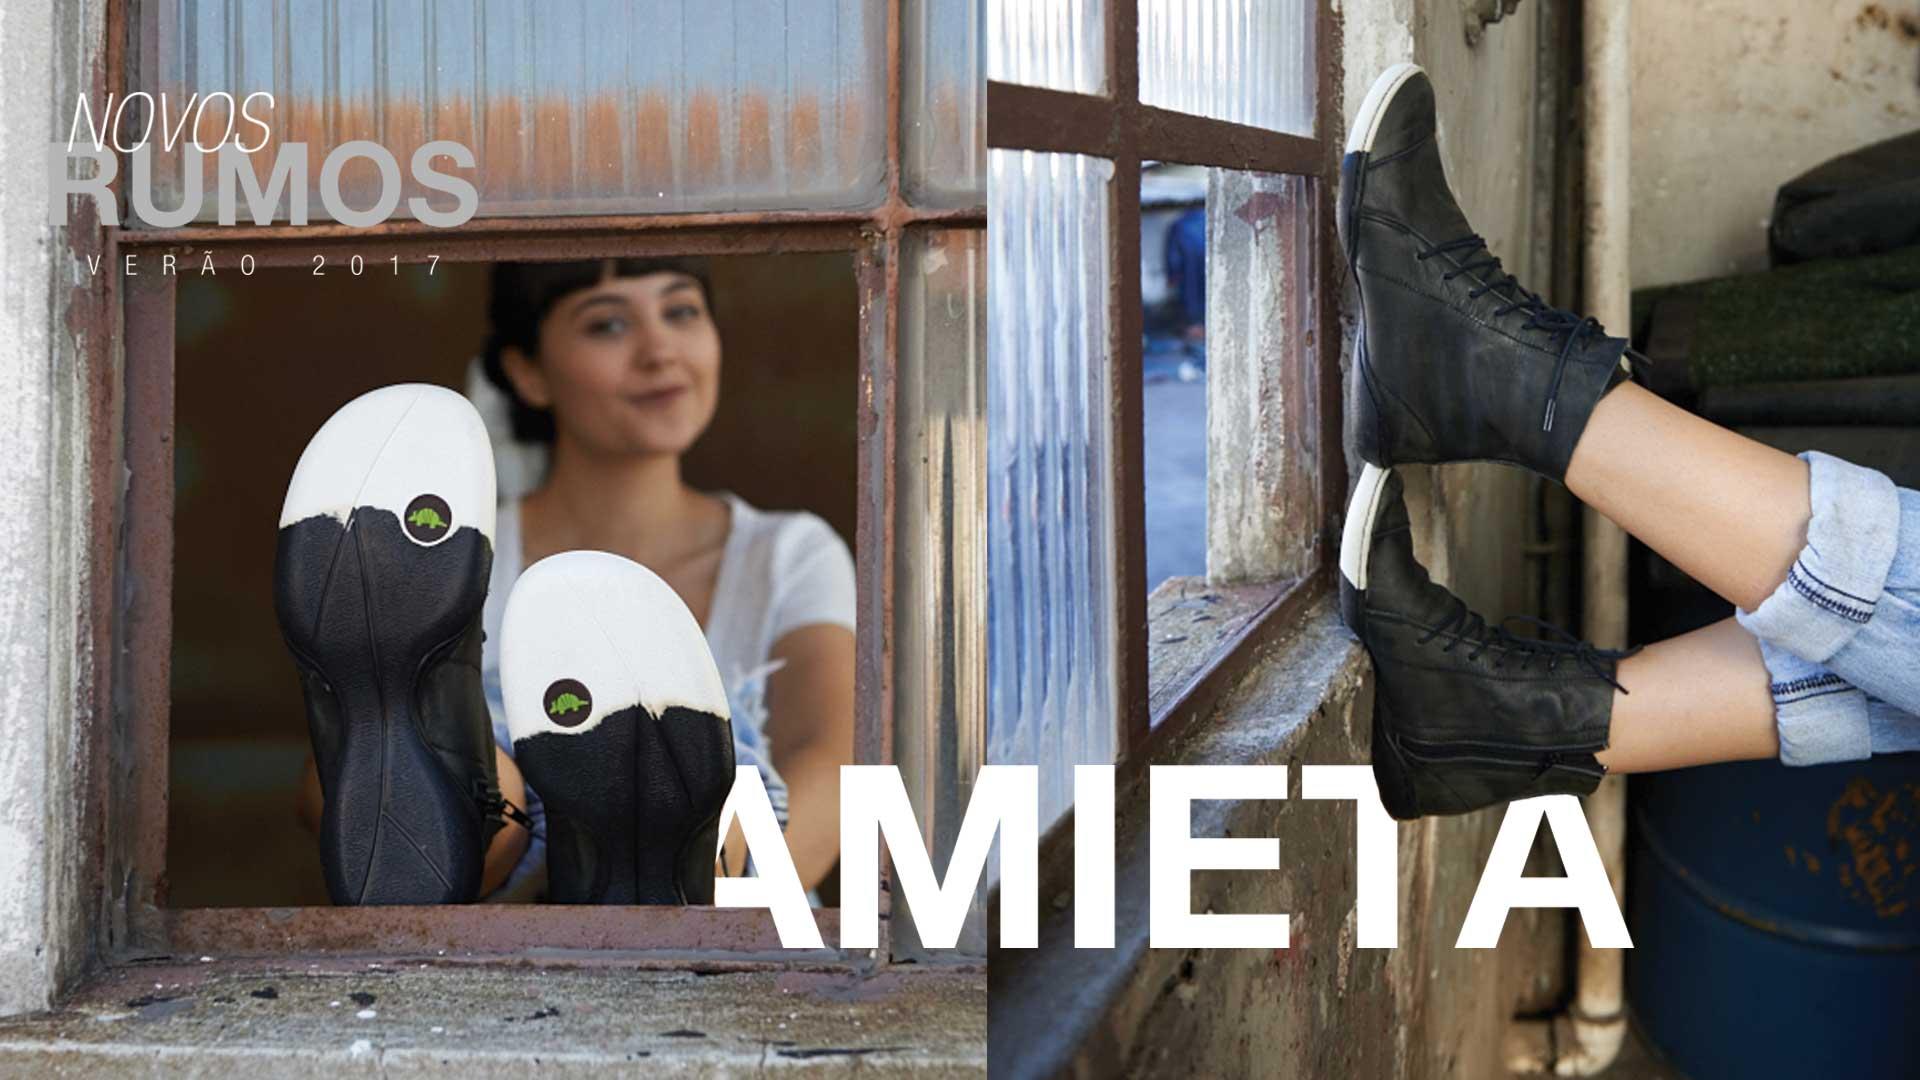 Amieta